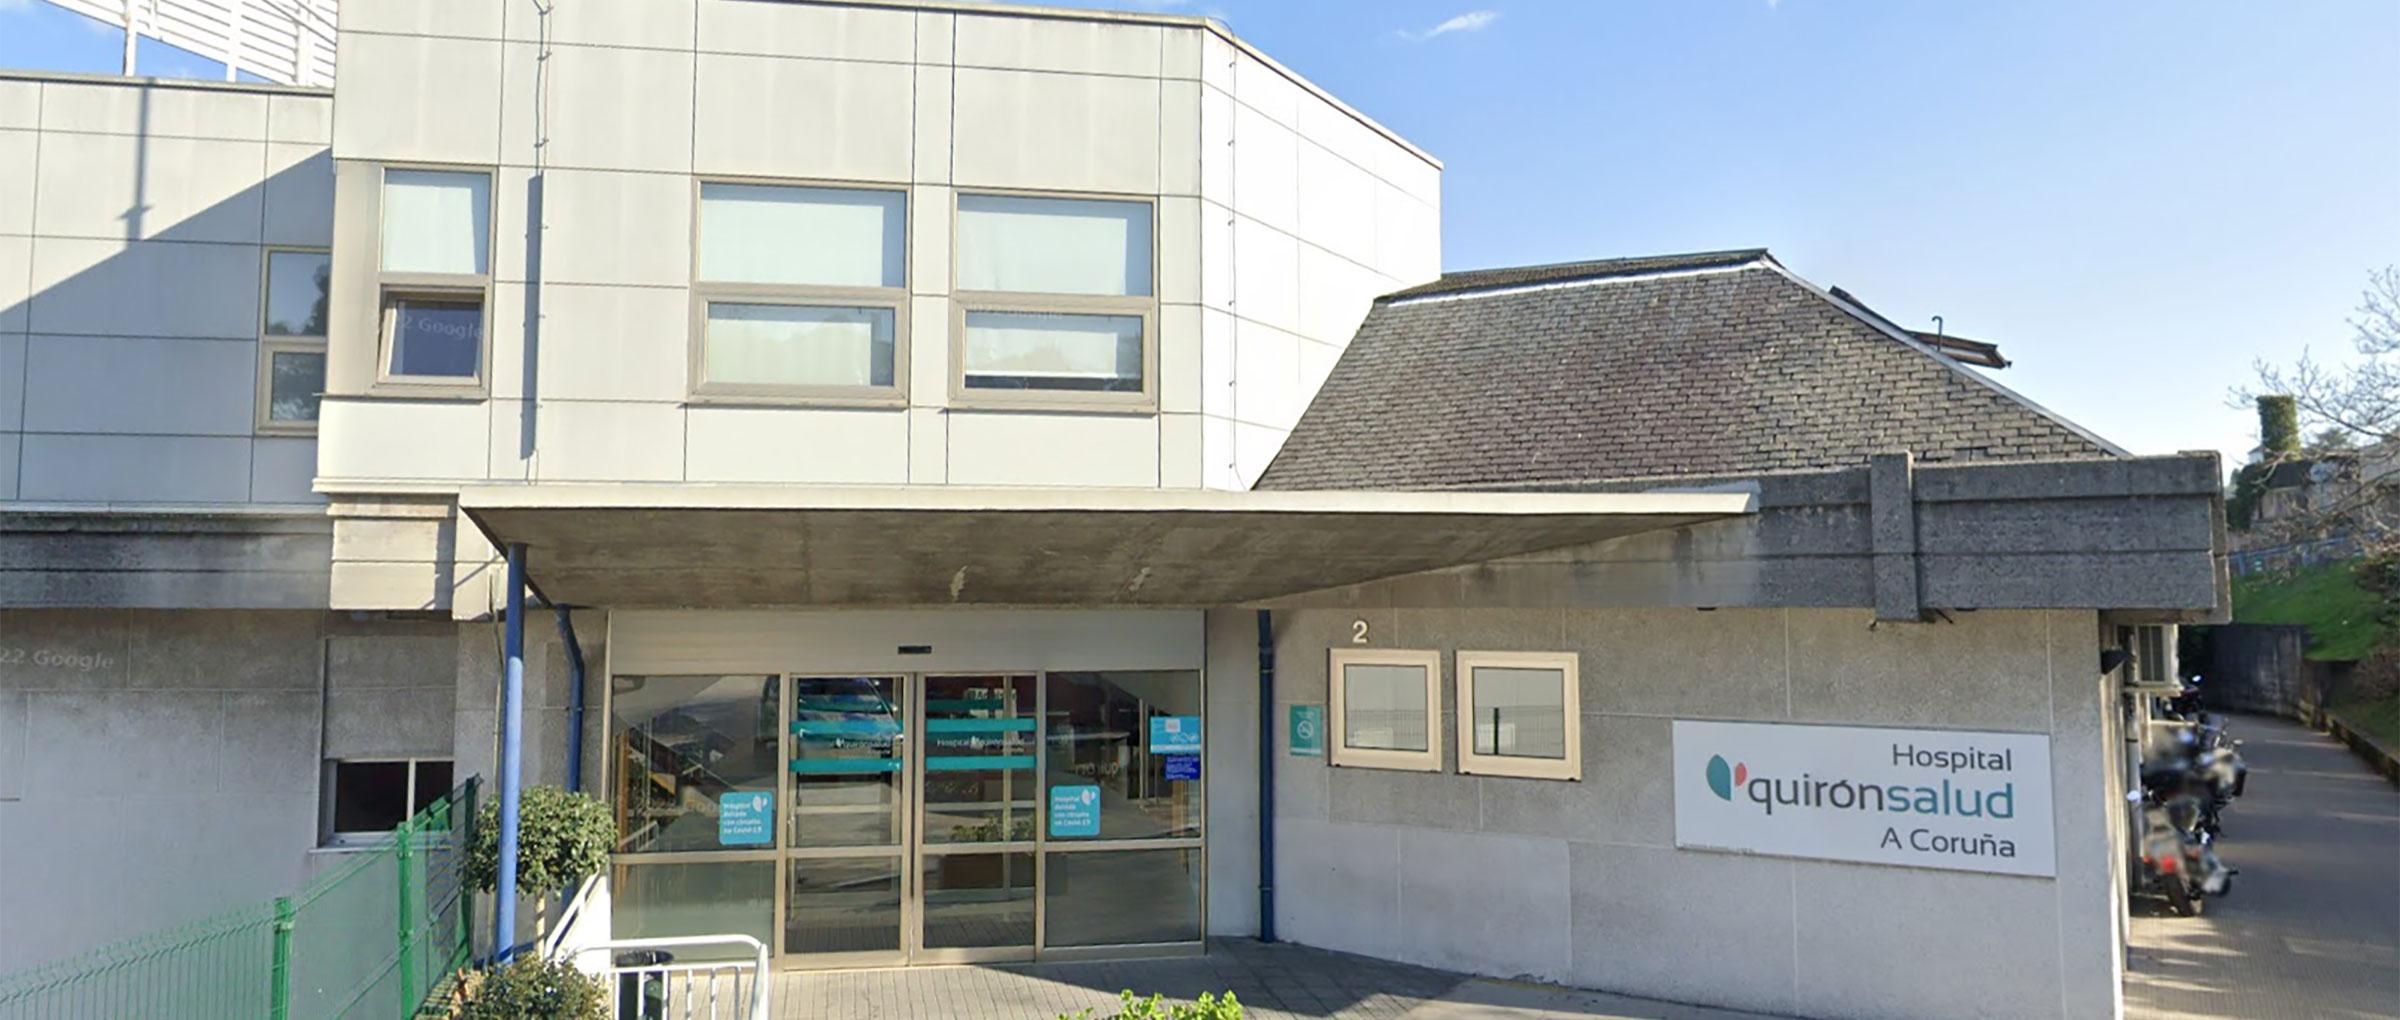 Hospital Quirónsalud A Coruña